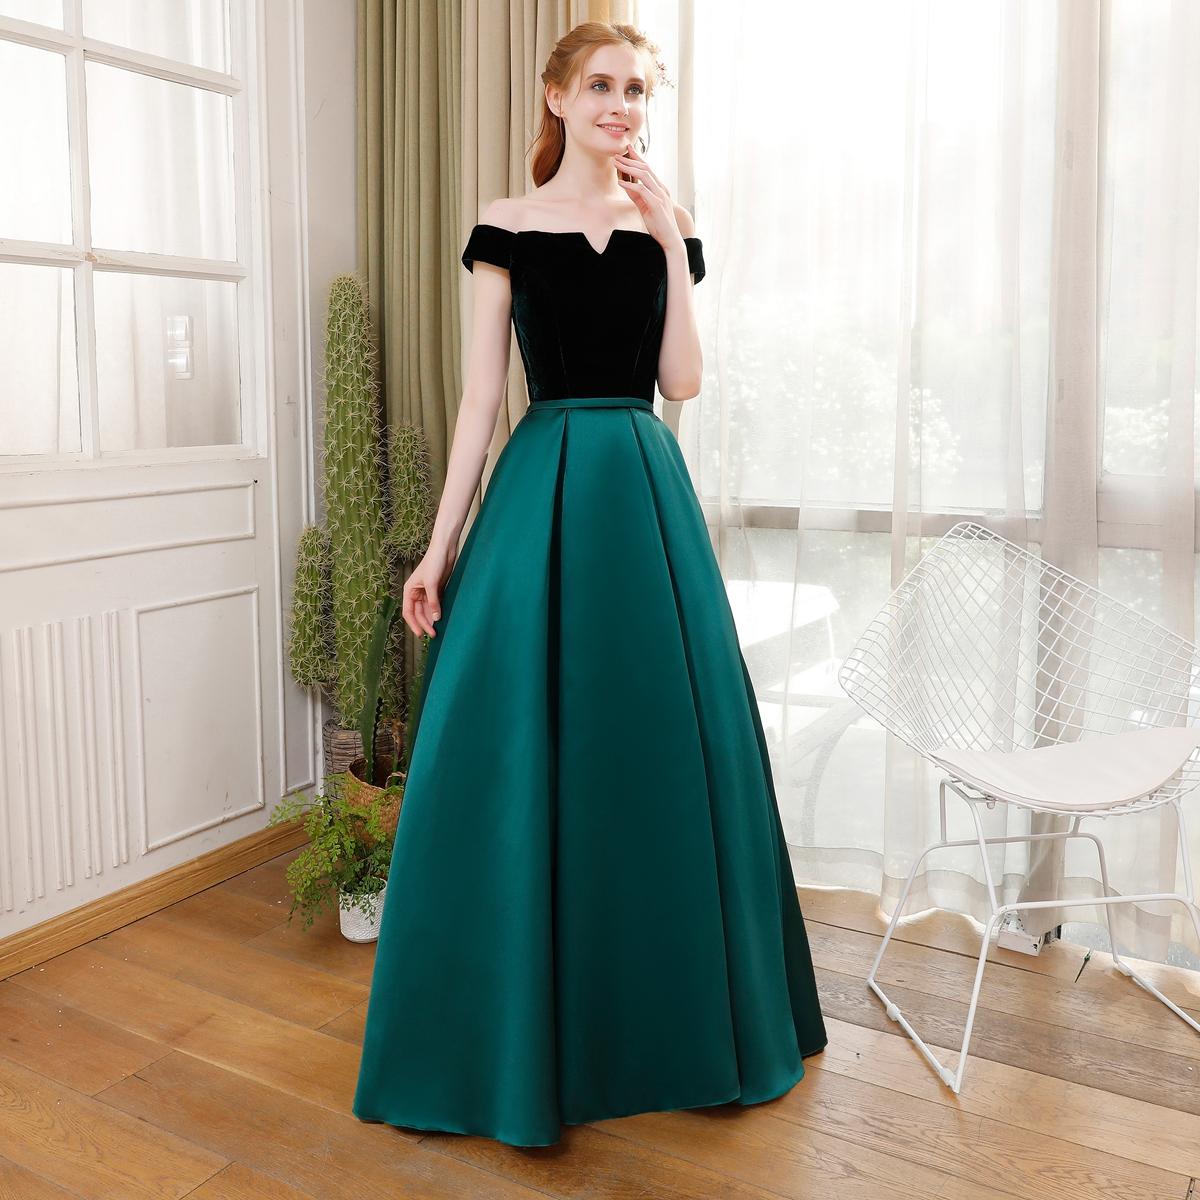 Simple And Elegant Wedding Dresses Boat Neck Three Quarter: Fashion Banquet Simple Elegant Evening Dress Bride Boat